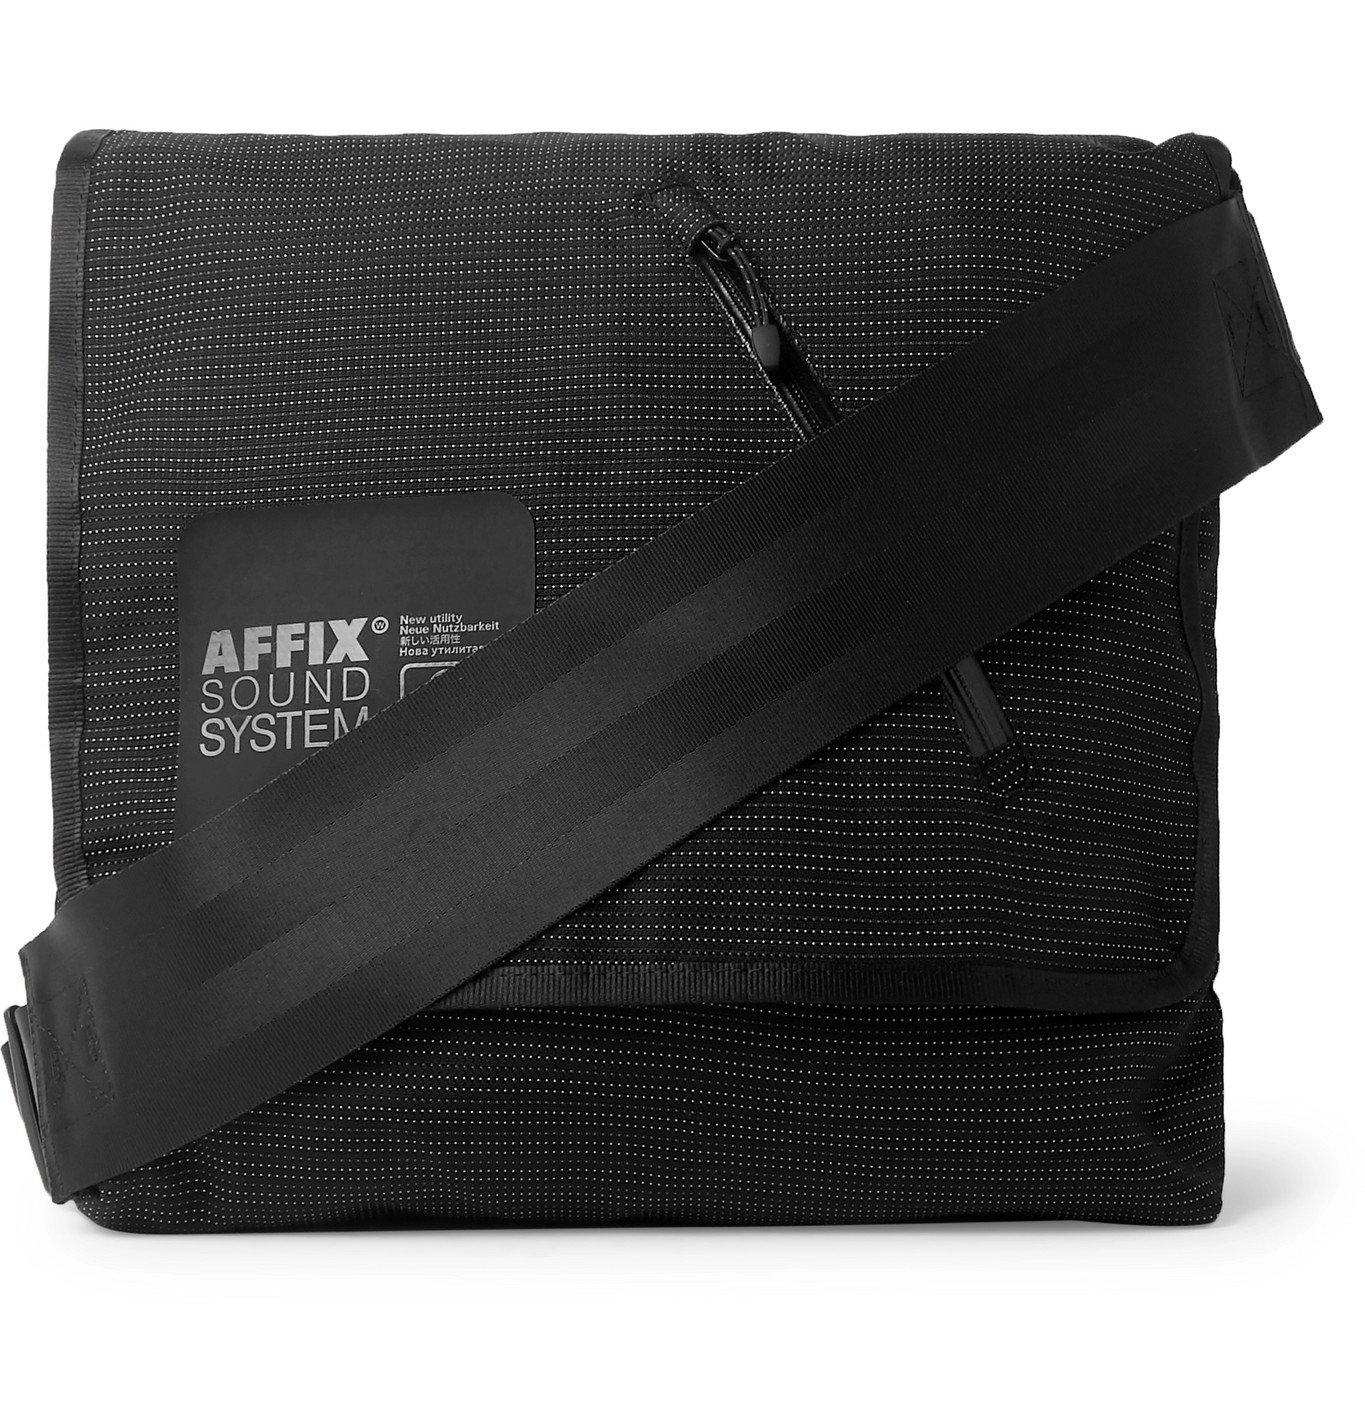 Photo: AFFIX - Visibility Reflective Embroidered Nylon Messenger Bag - Black